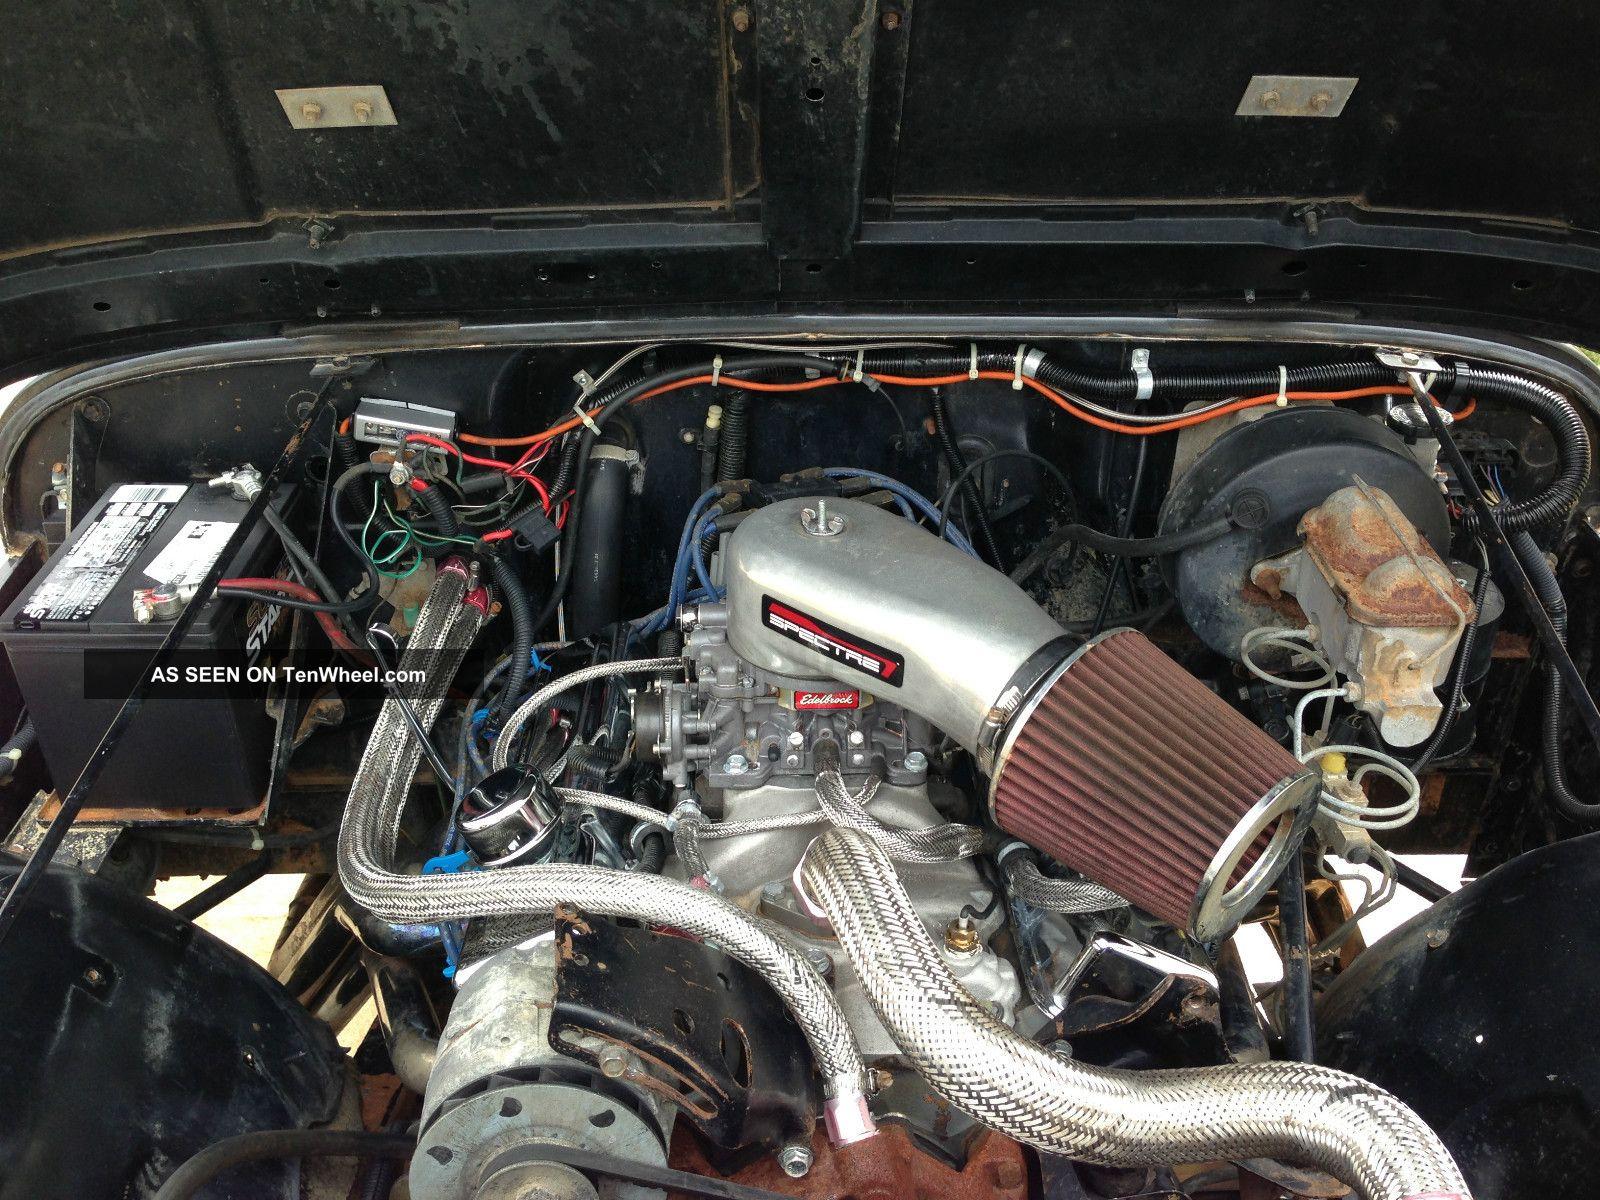 Wiring Diagram Yj 350 Swap Schematics Wiring Diagrams U2022 Rh  Seniorlivinguniversity Co Jeep 350 Engine Swap